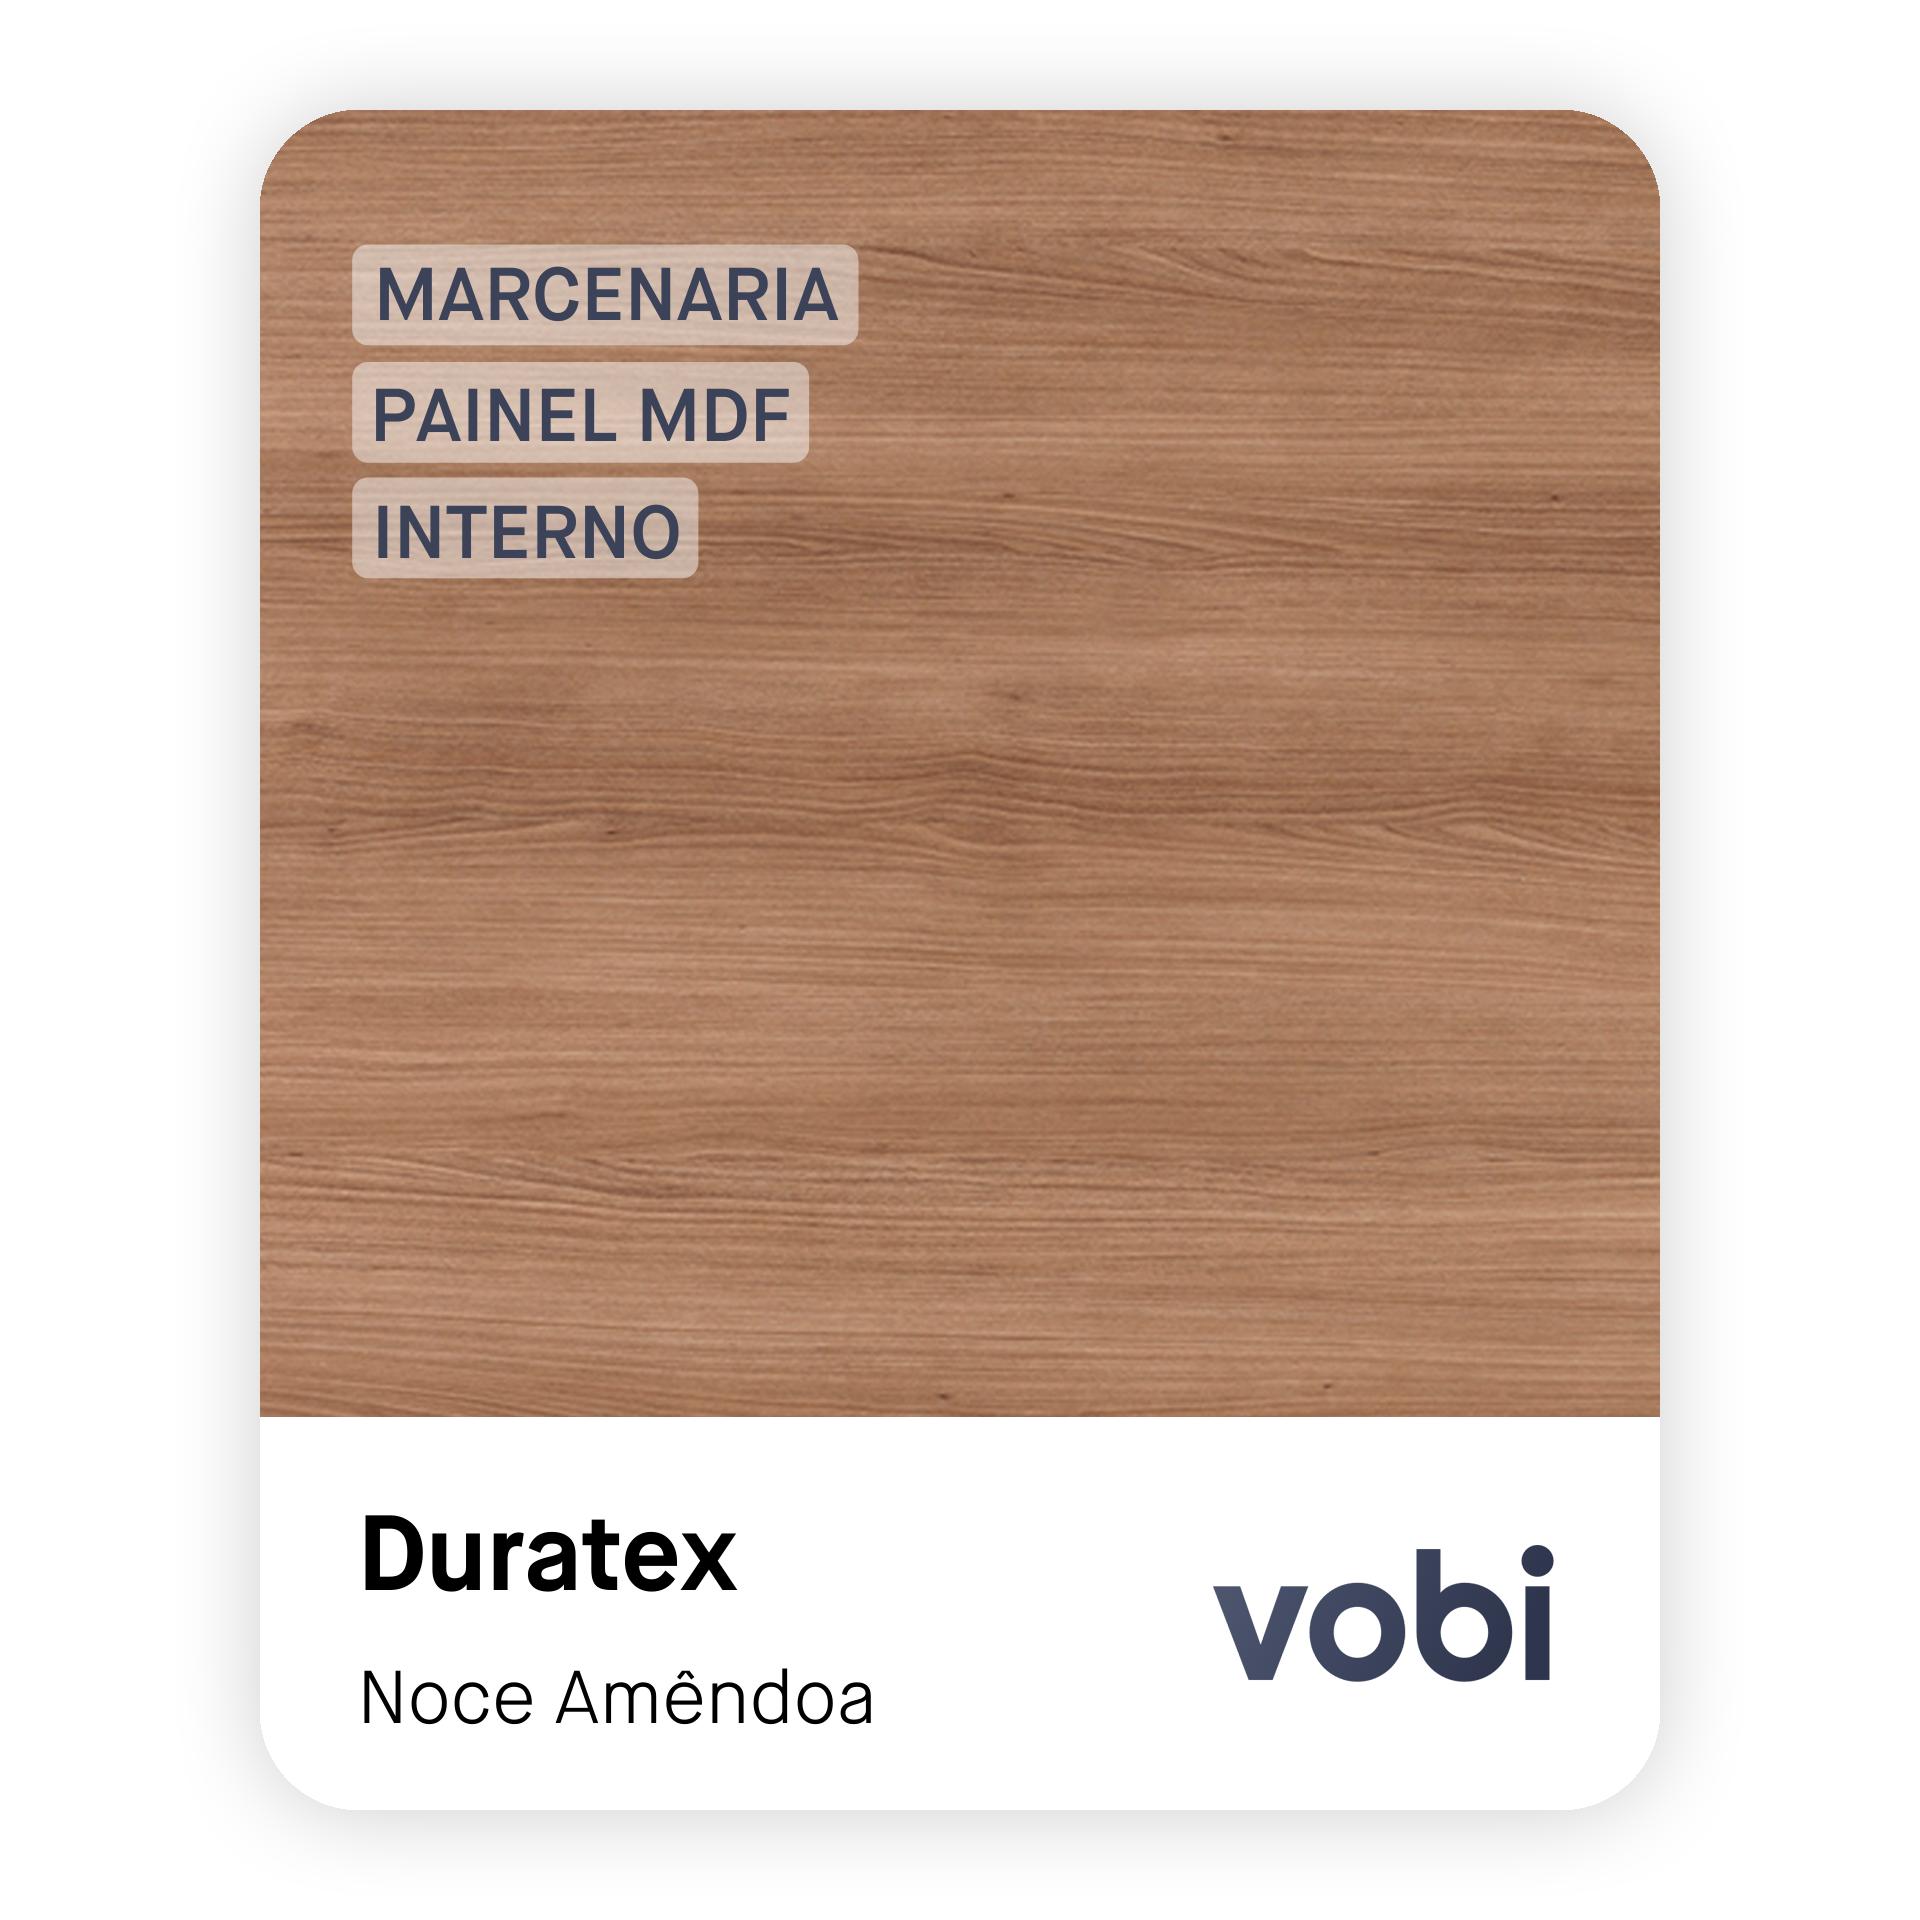 marcenaria painel mdf madeira interno